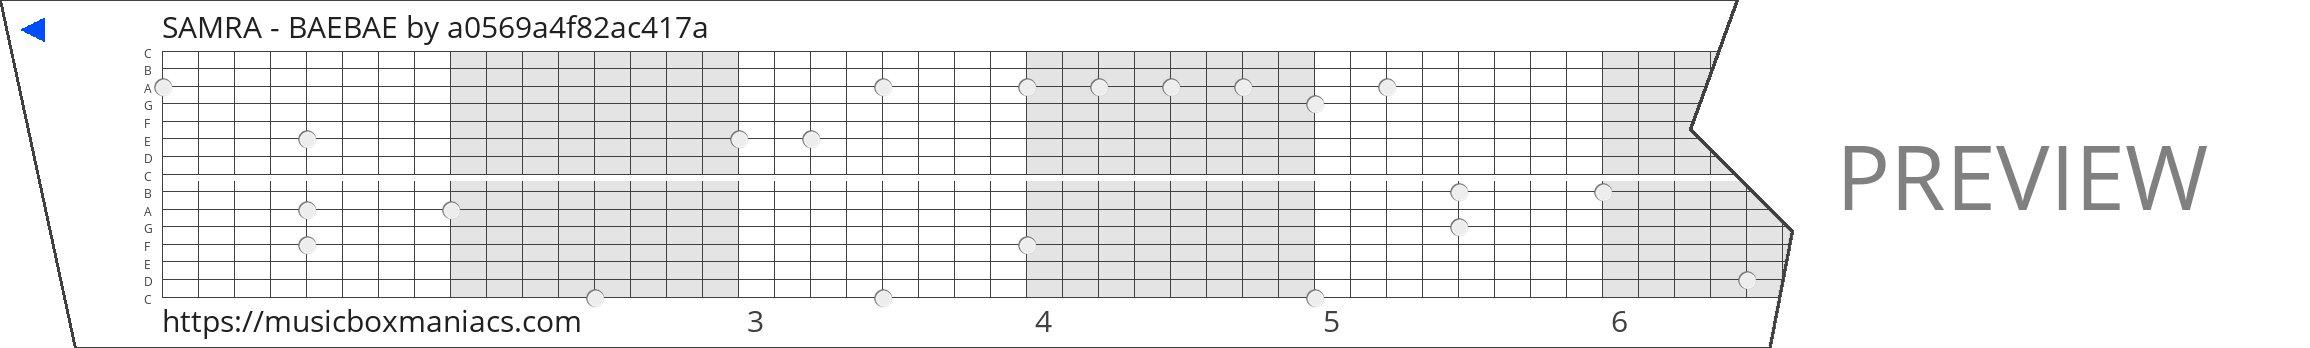 SAMRA - BAEBAE 15 note music box paper strip